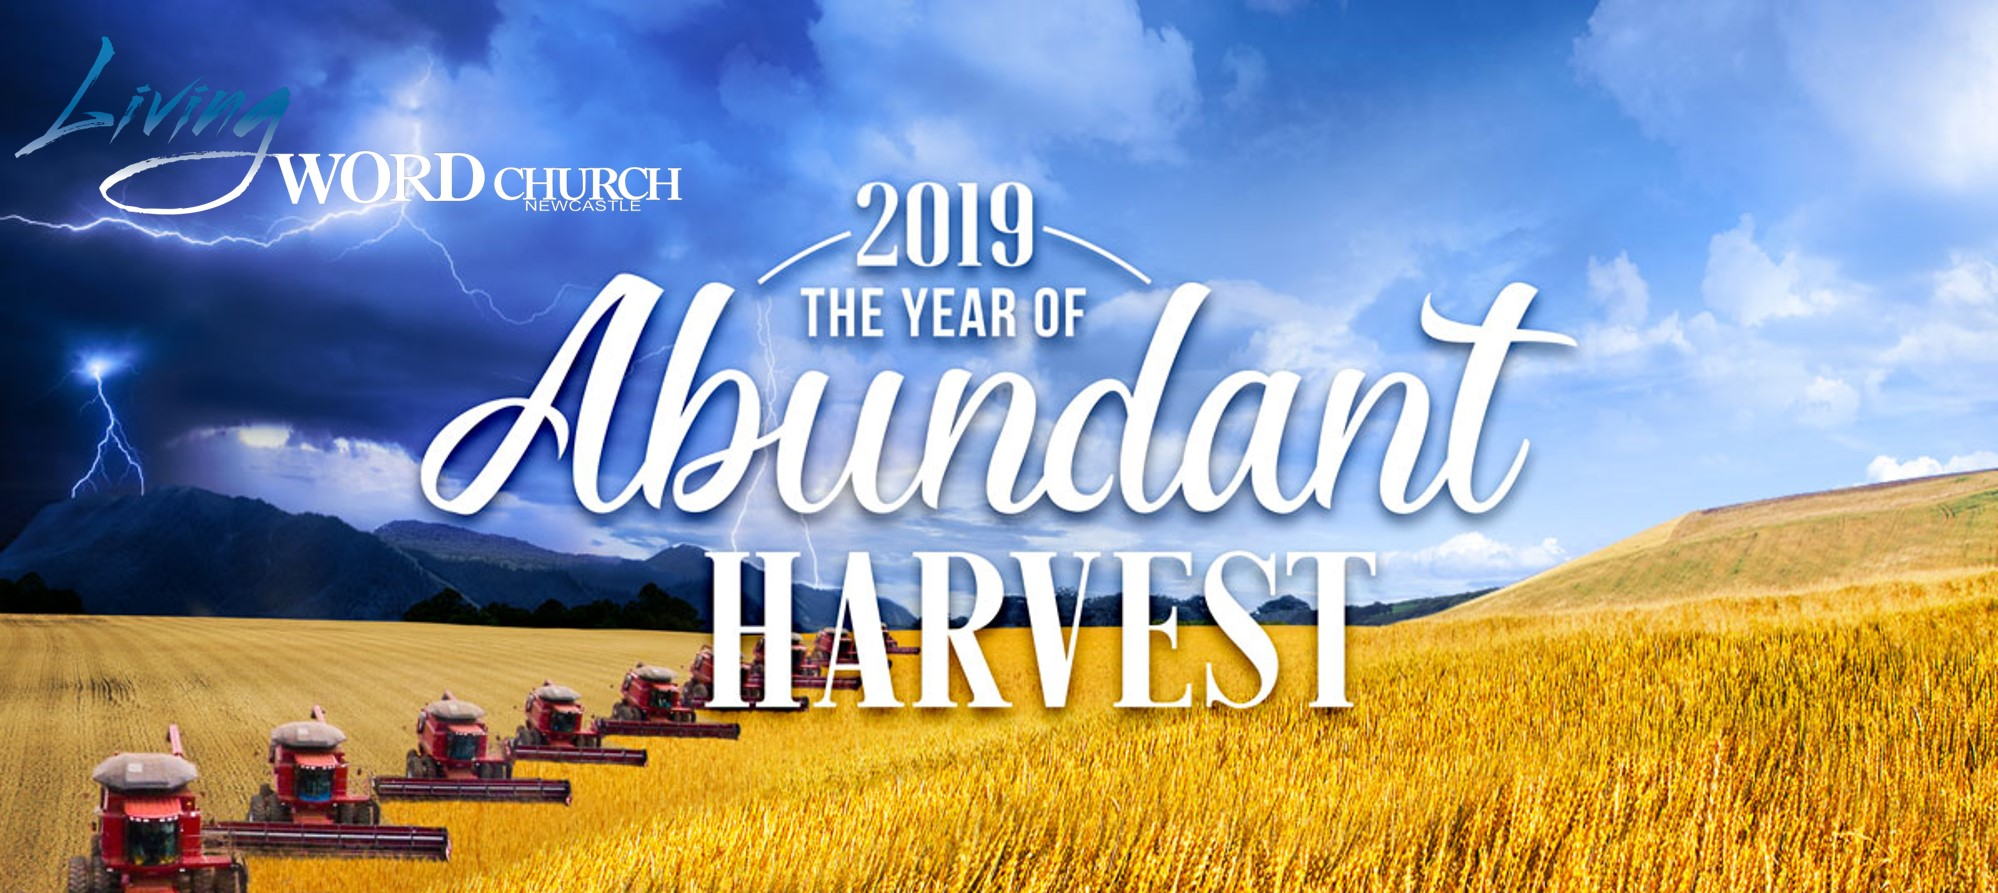 2019 The Year of Abundant Harvest